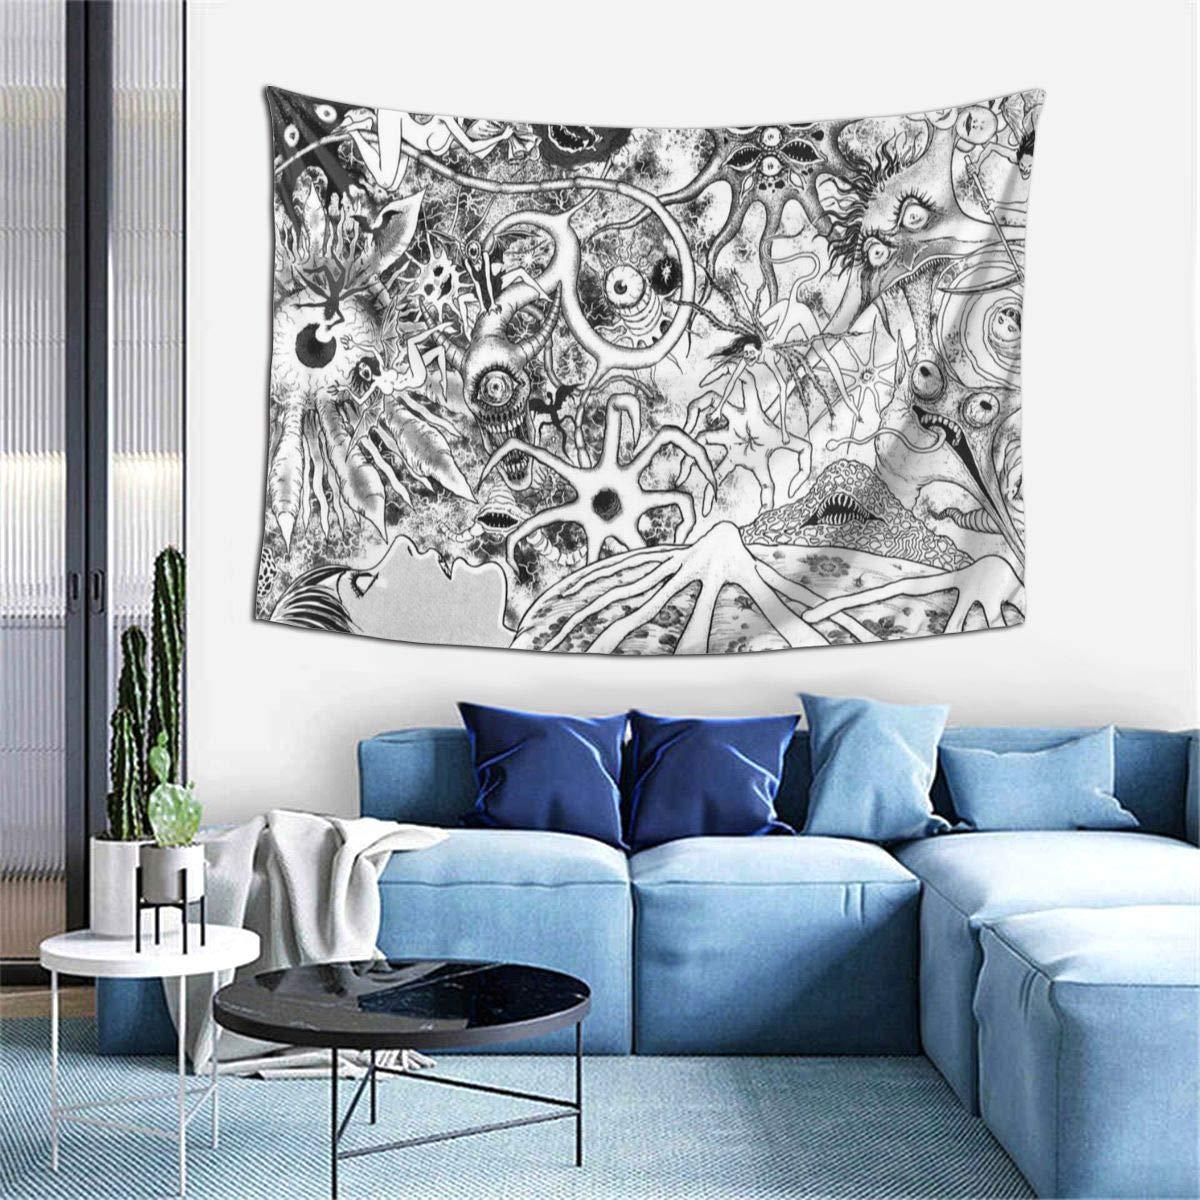 Junji Wall Tapestry Junji Ito Uzumaki Collage Wall Tapestry